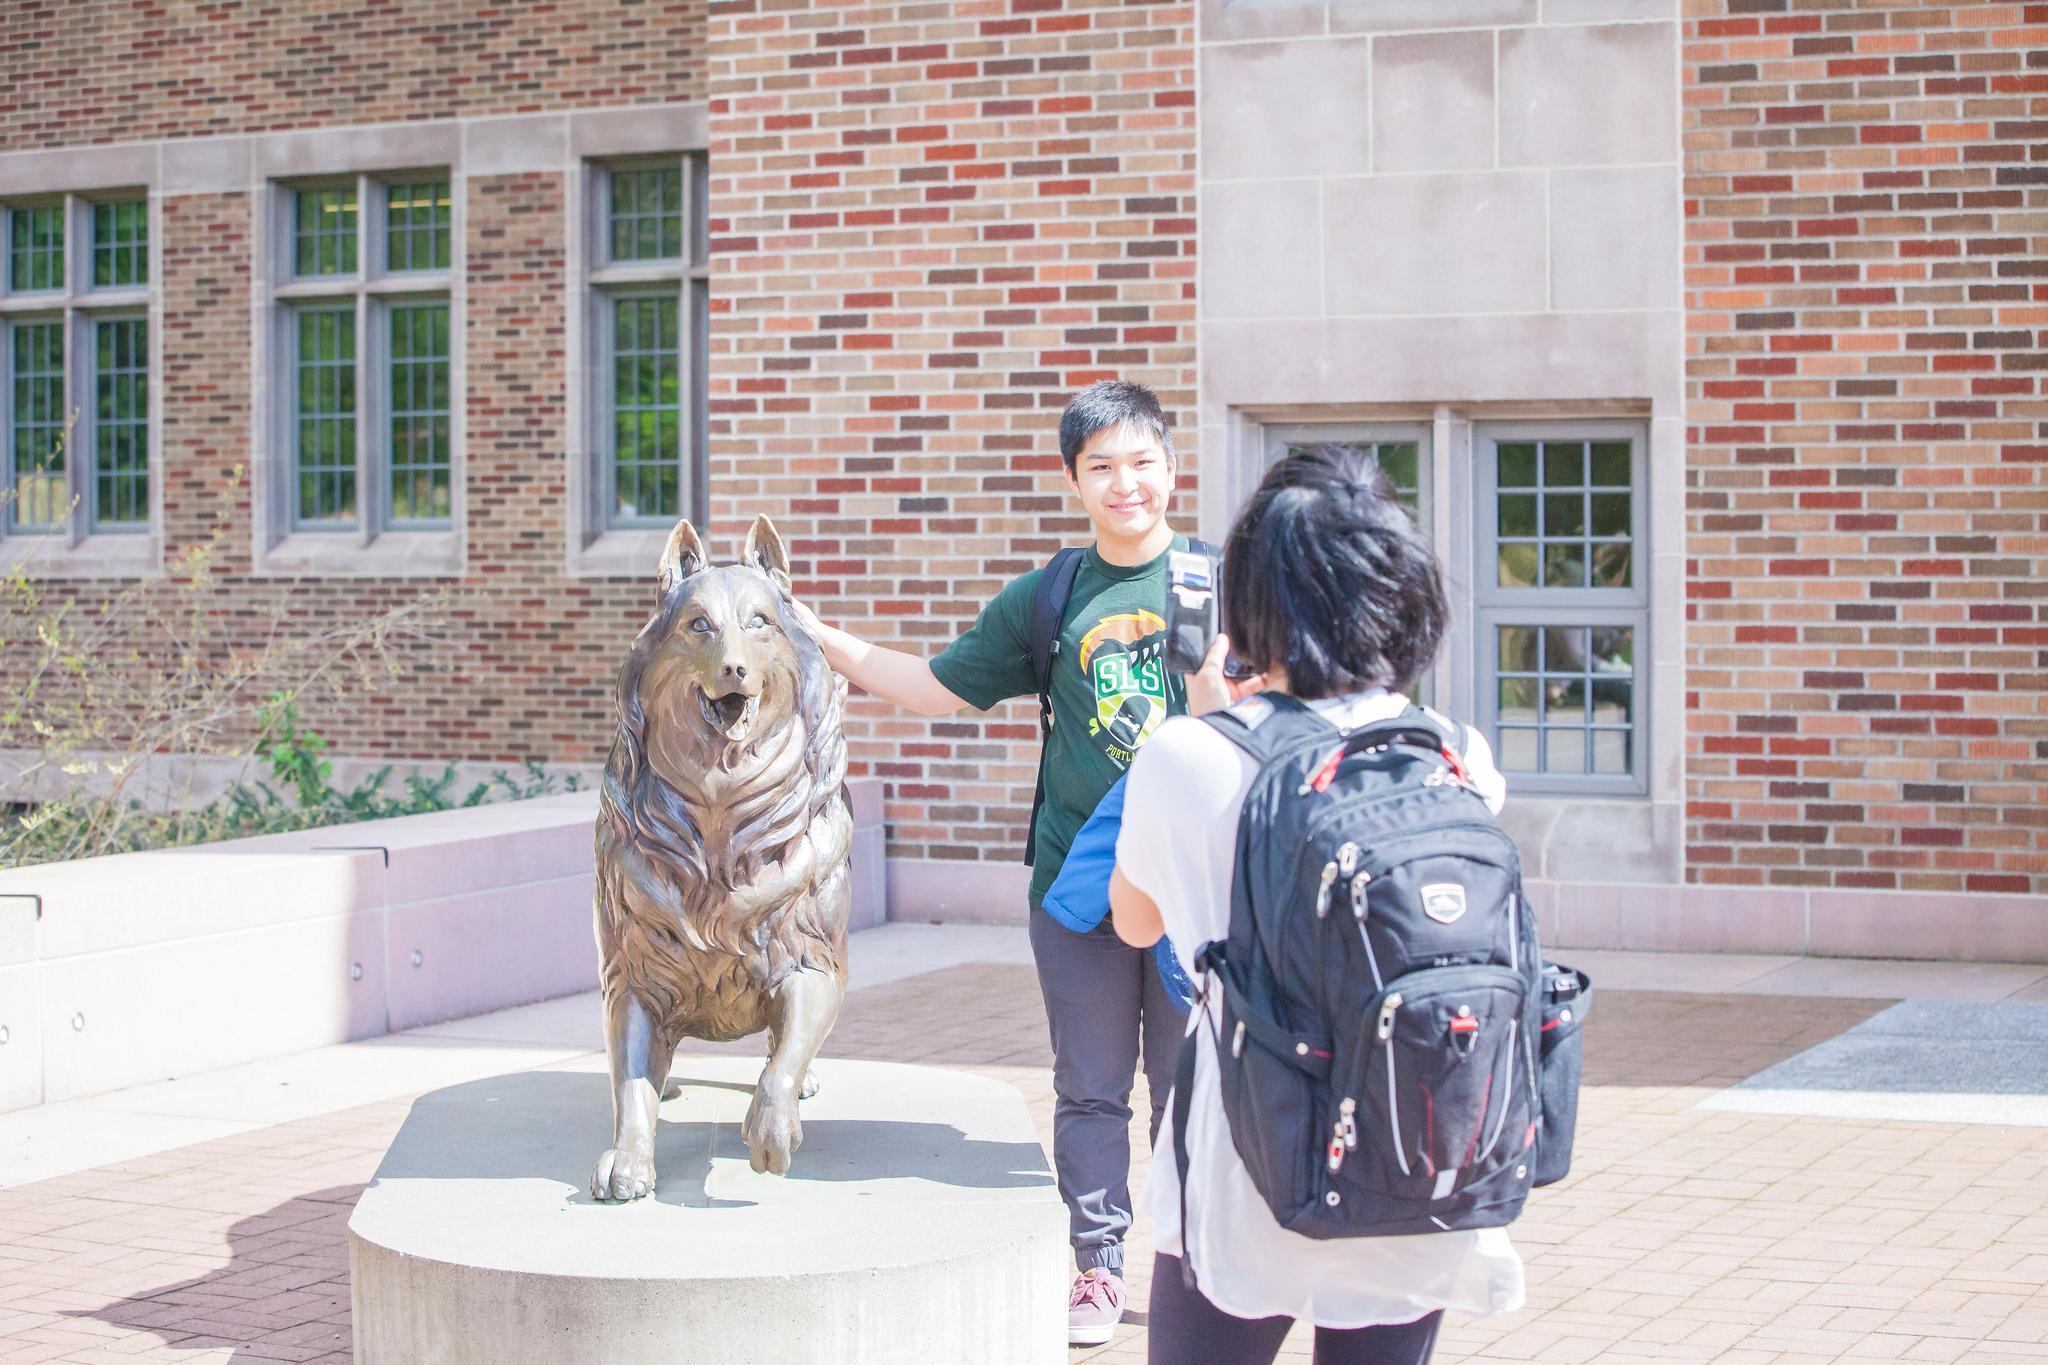 Dubs statue